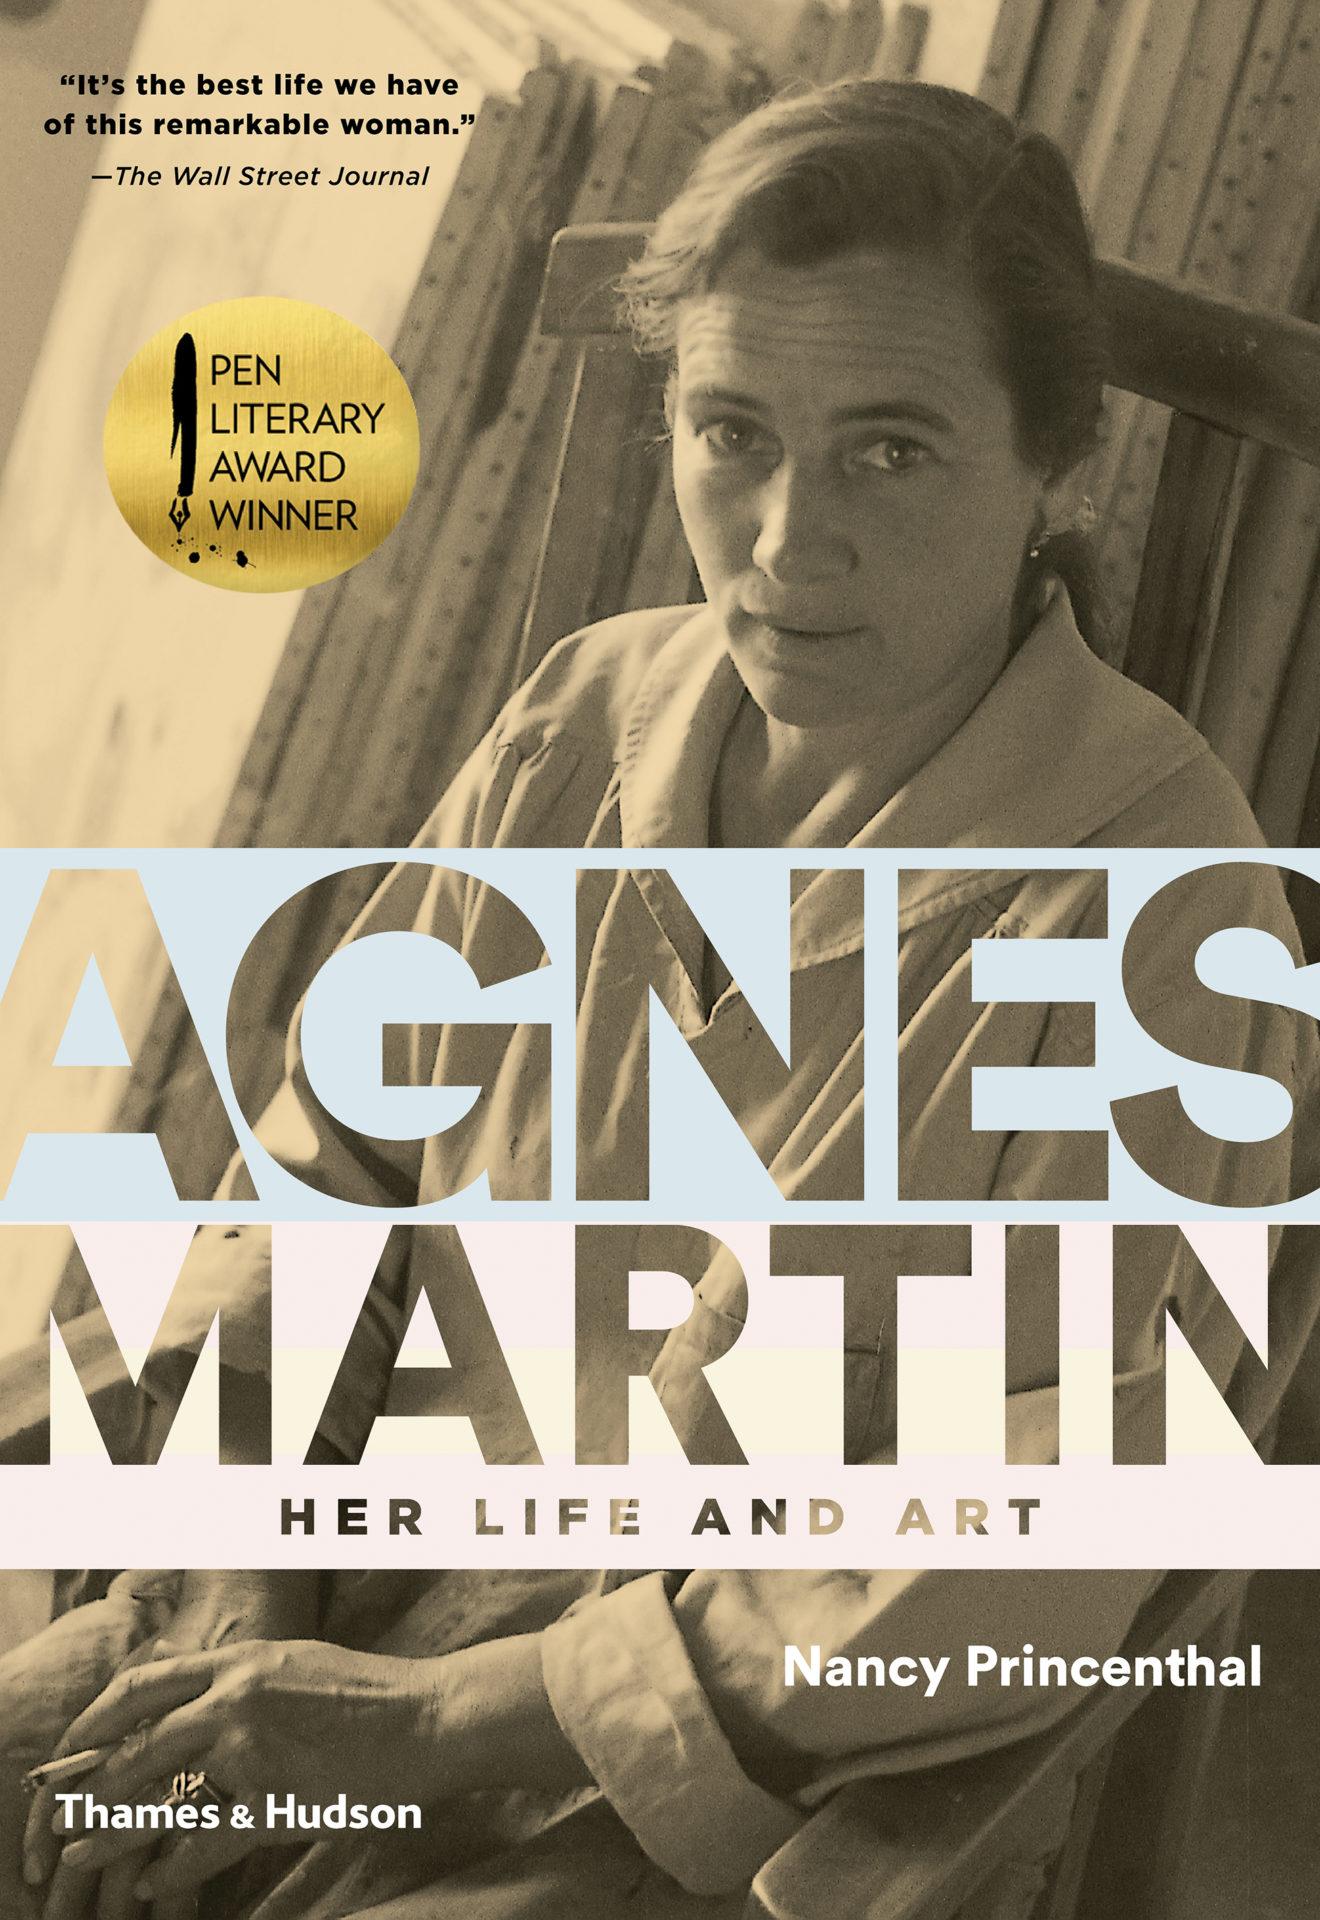 Agnes-Martin-PB-9780500294550-1320x1920.jpg